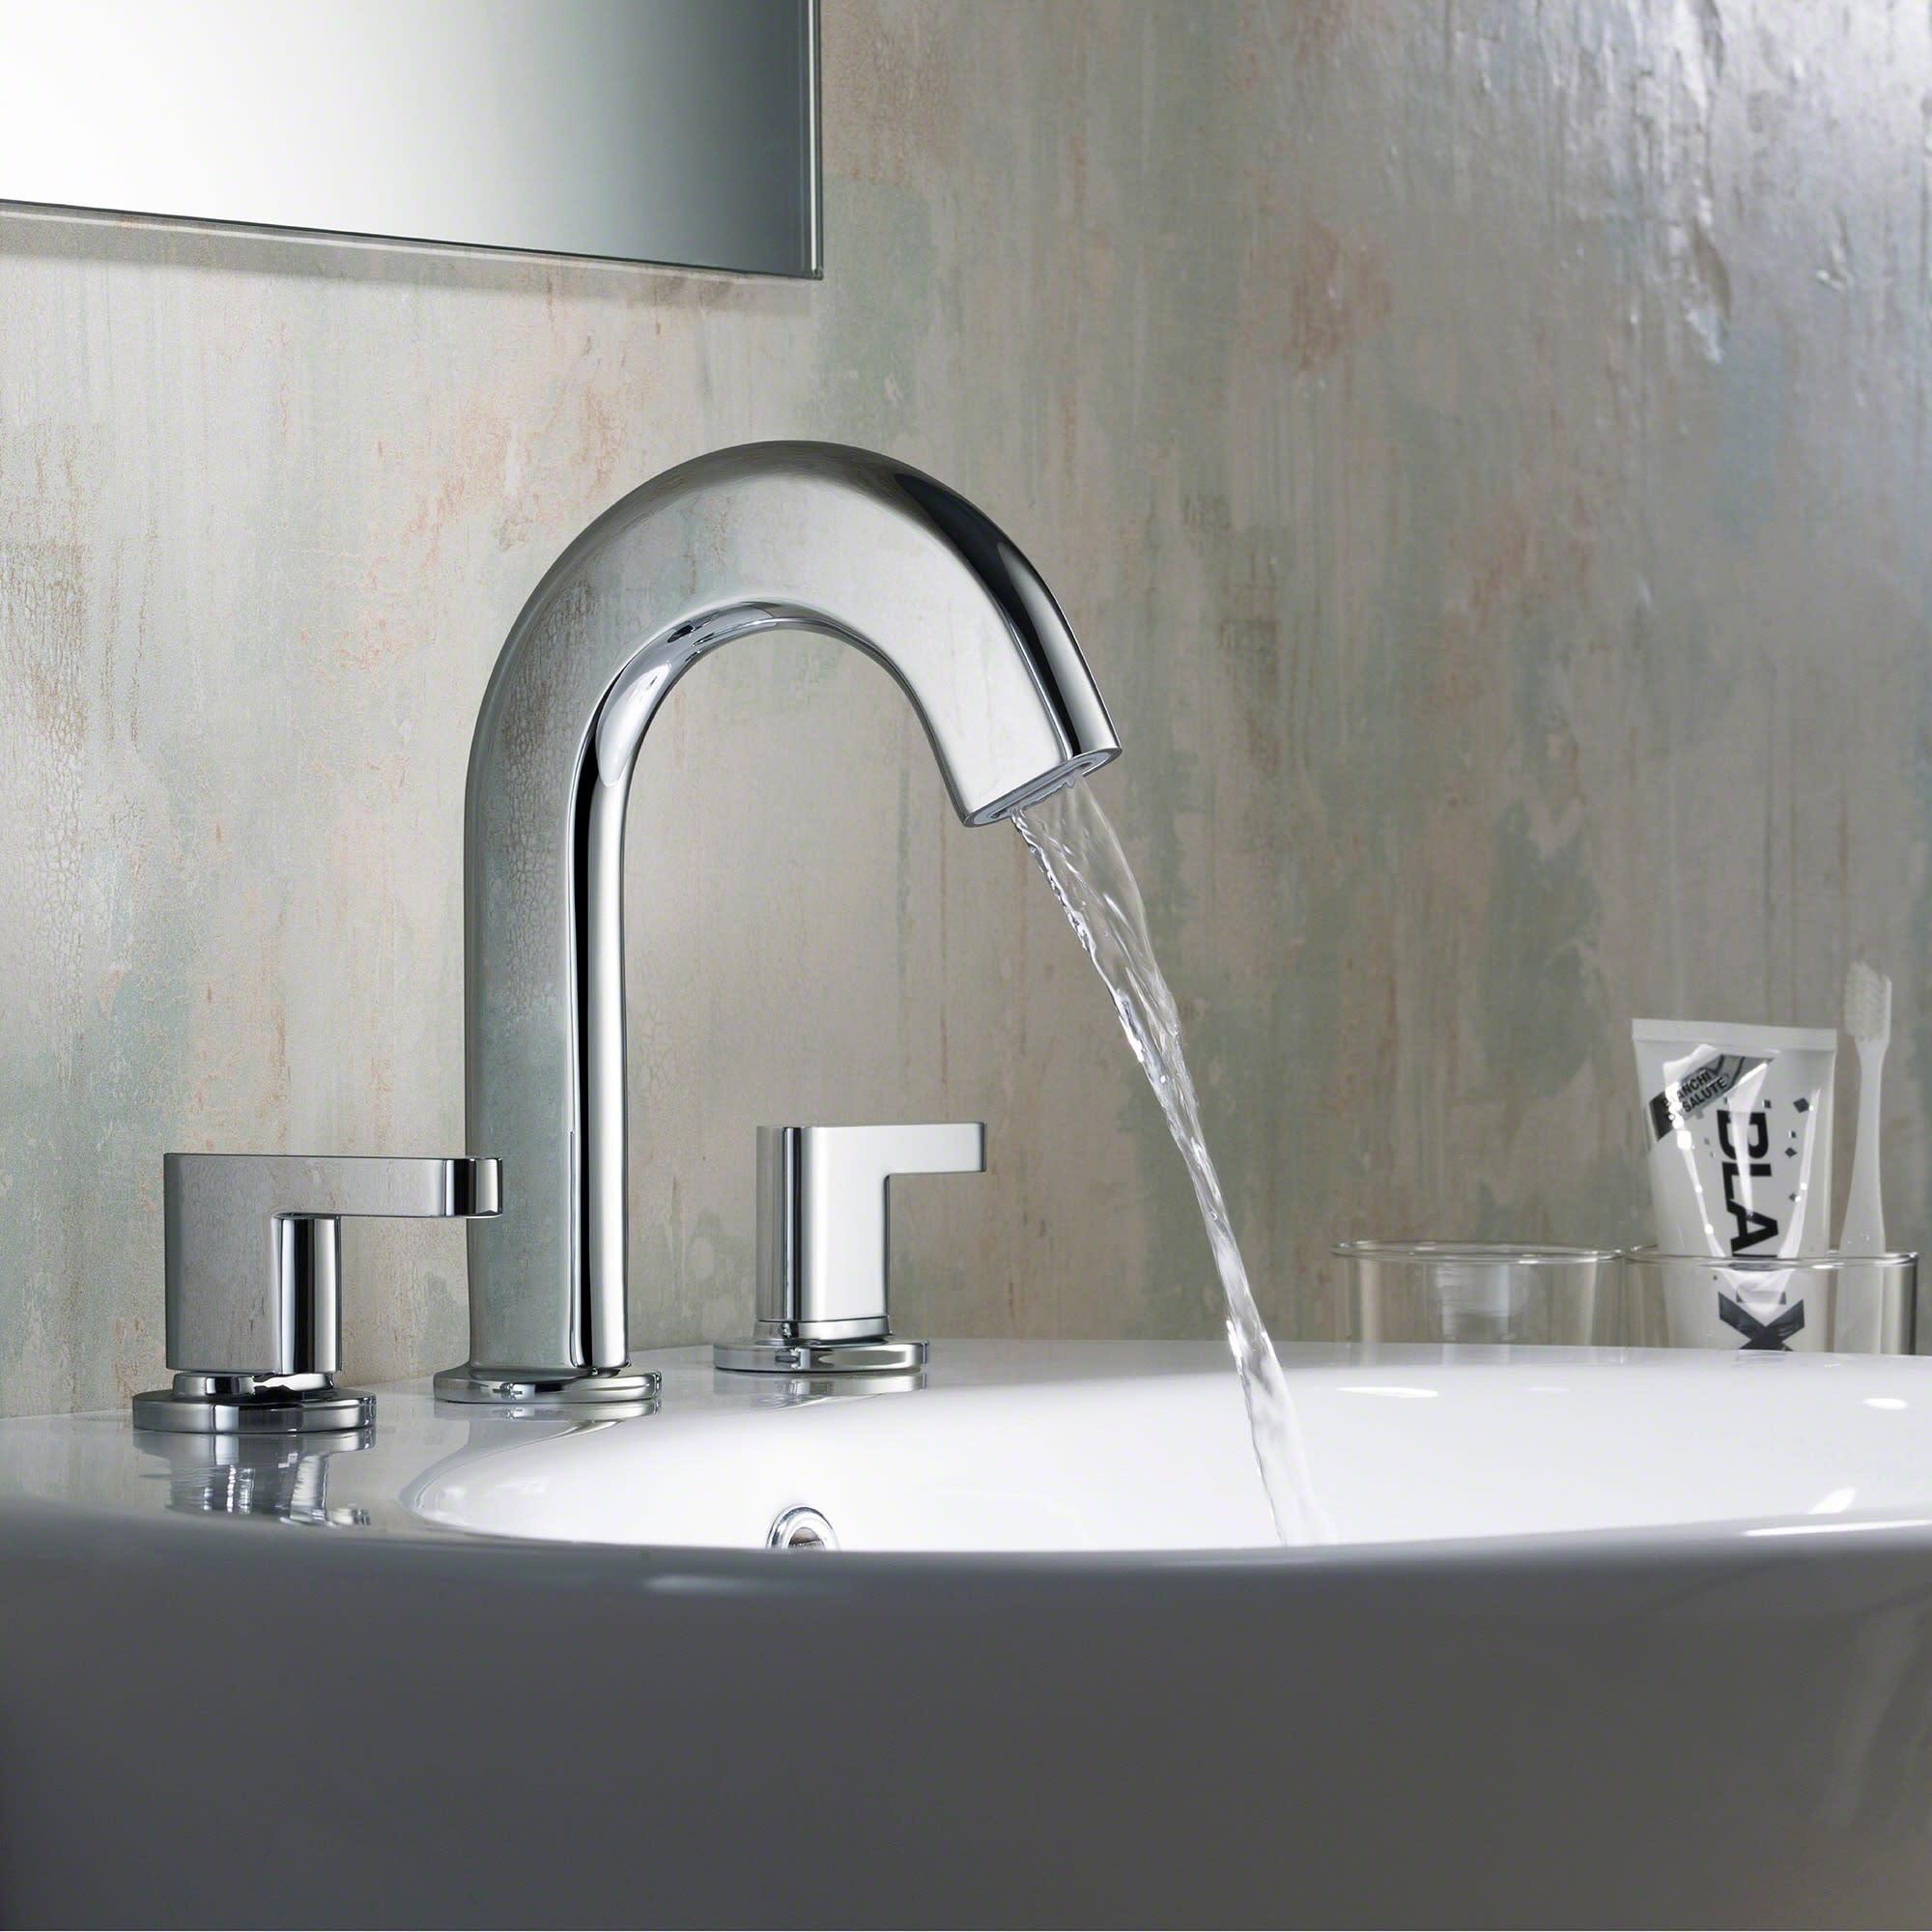 kraus ino twohandle bathroom faucet - Kraus Faucets